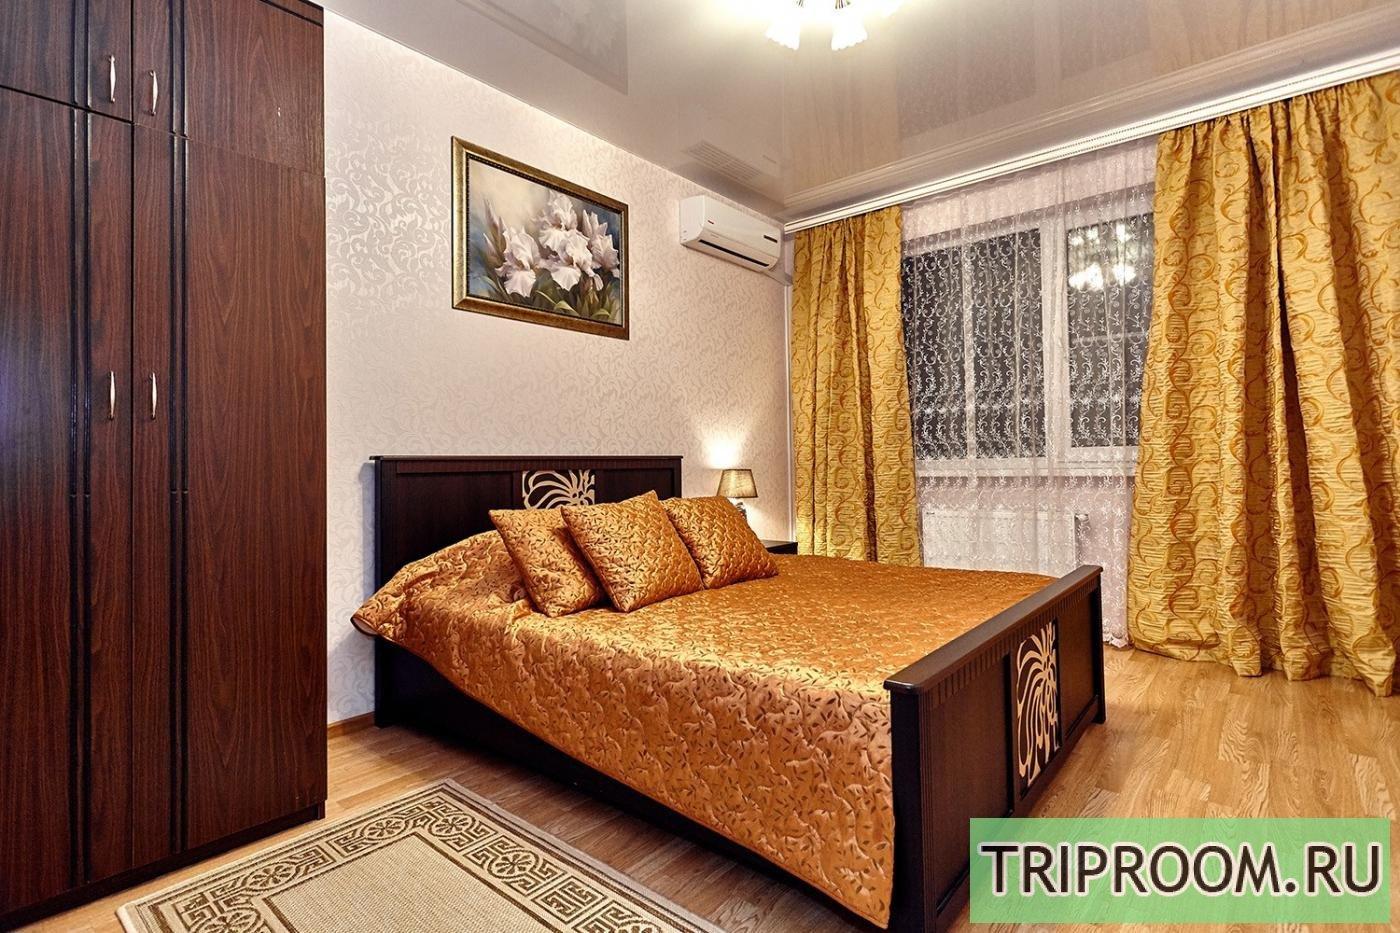 2-комнатная квартира посуточно (вариант № 10581), ул. Соколова улица, фото № 1